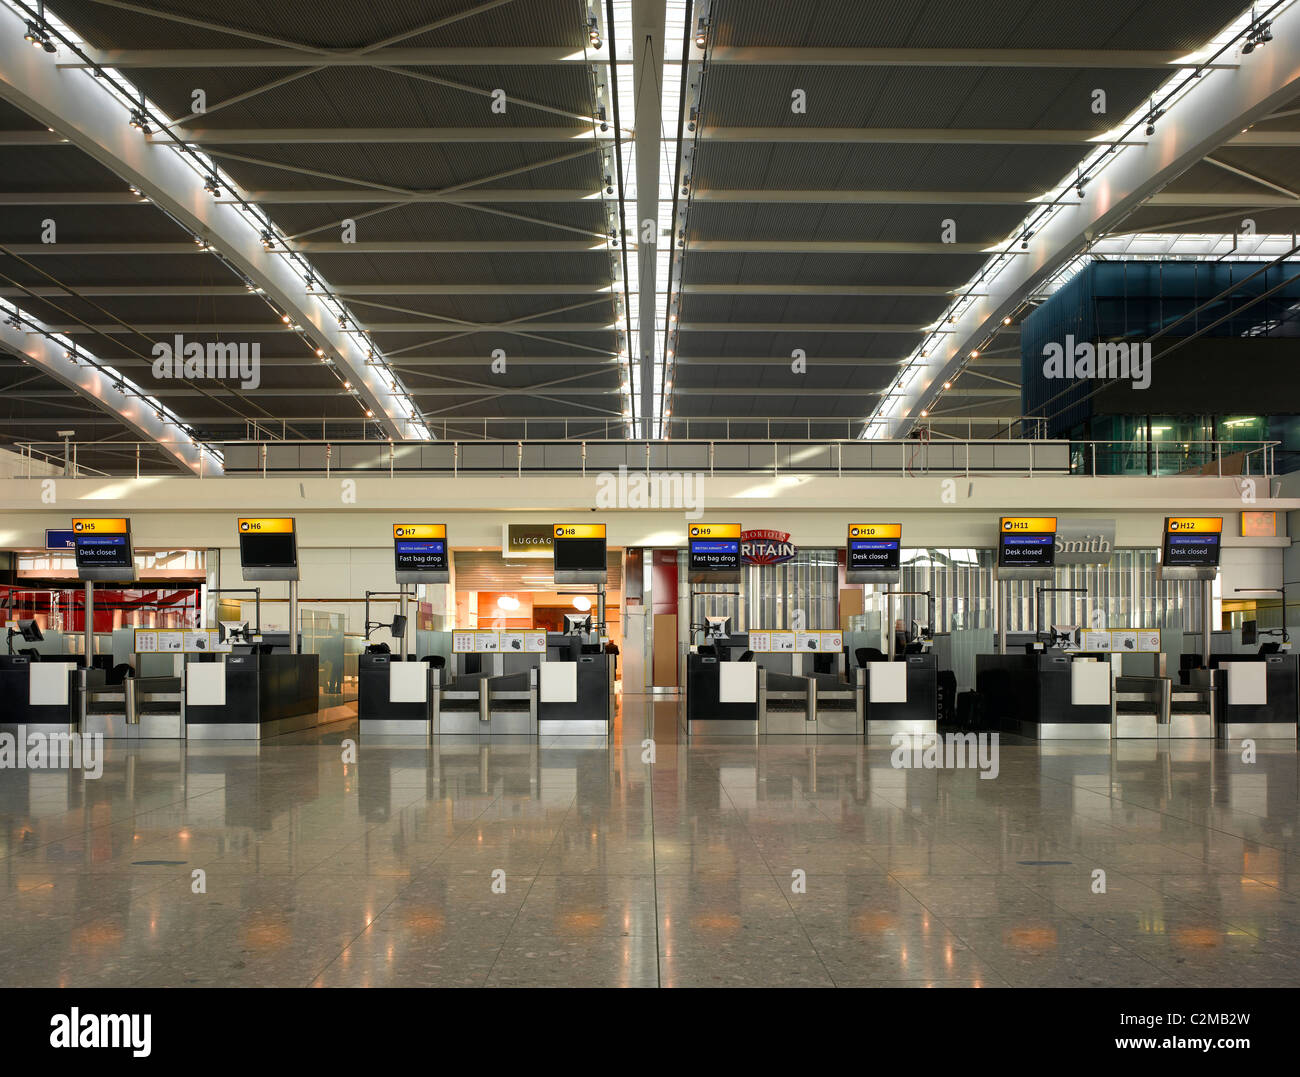 Terminal 5, Heathrow Airport, London. - Stock Image